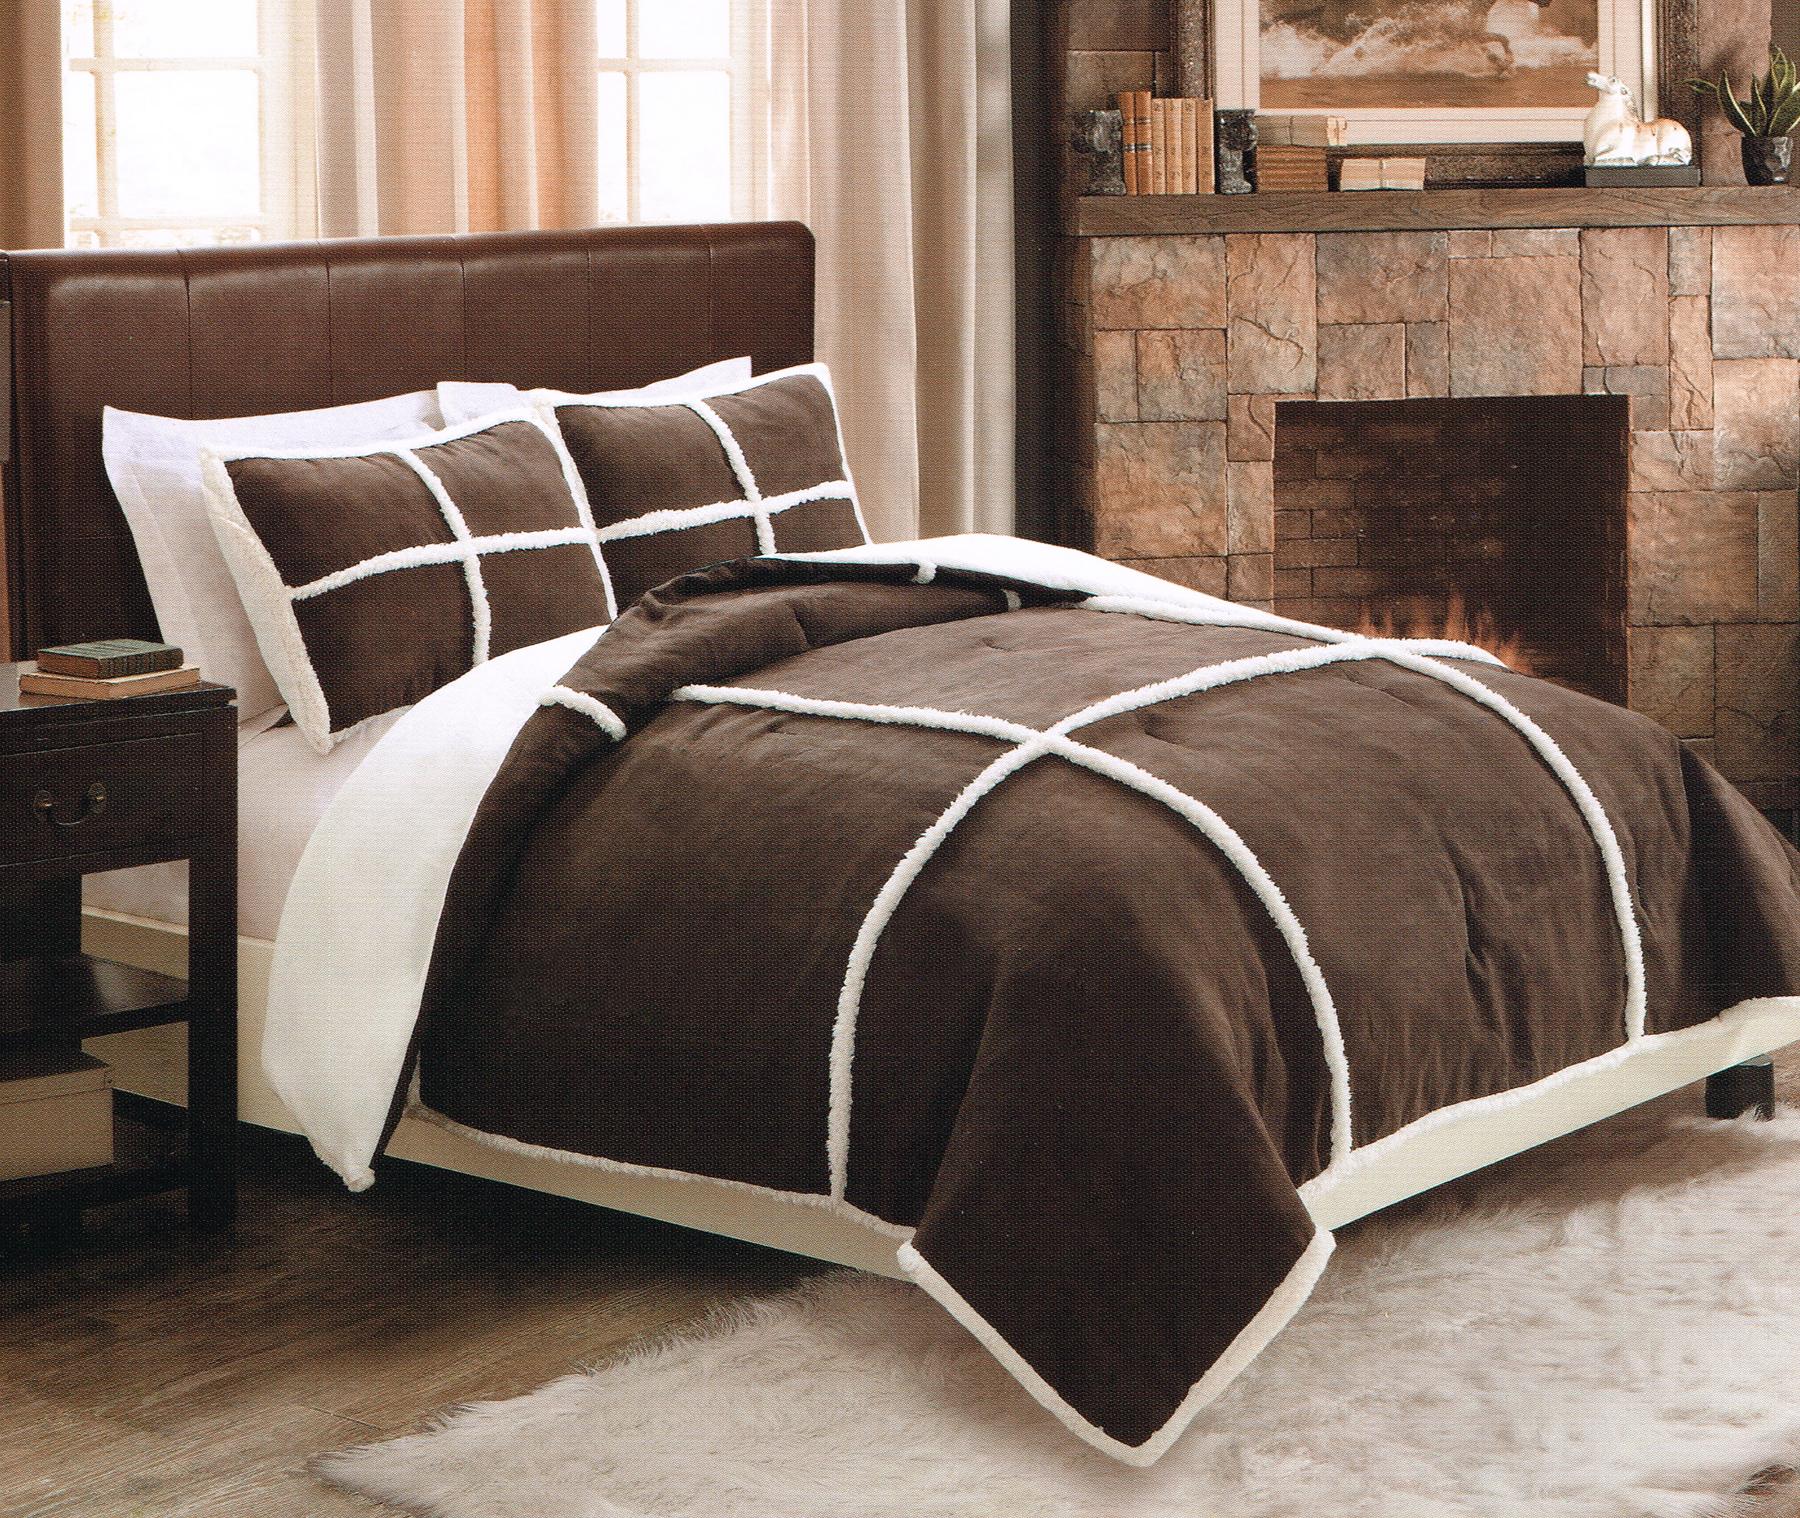 Seasons Microsuede Sherpa Comforter Set with Shams